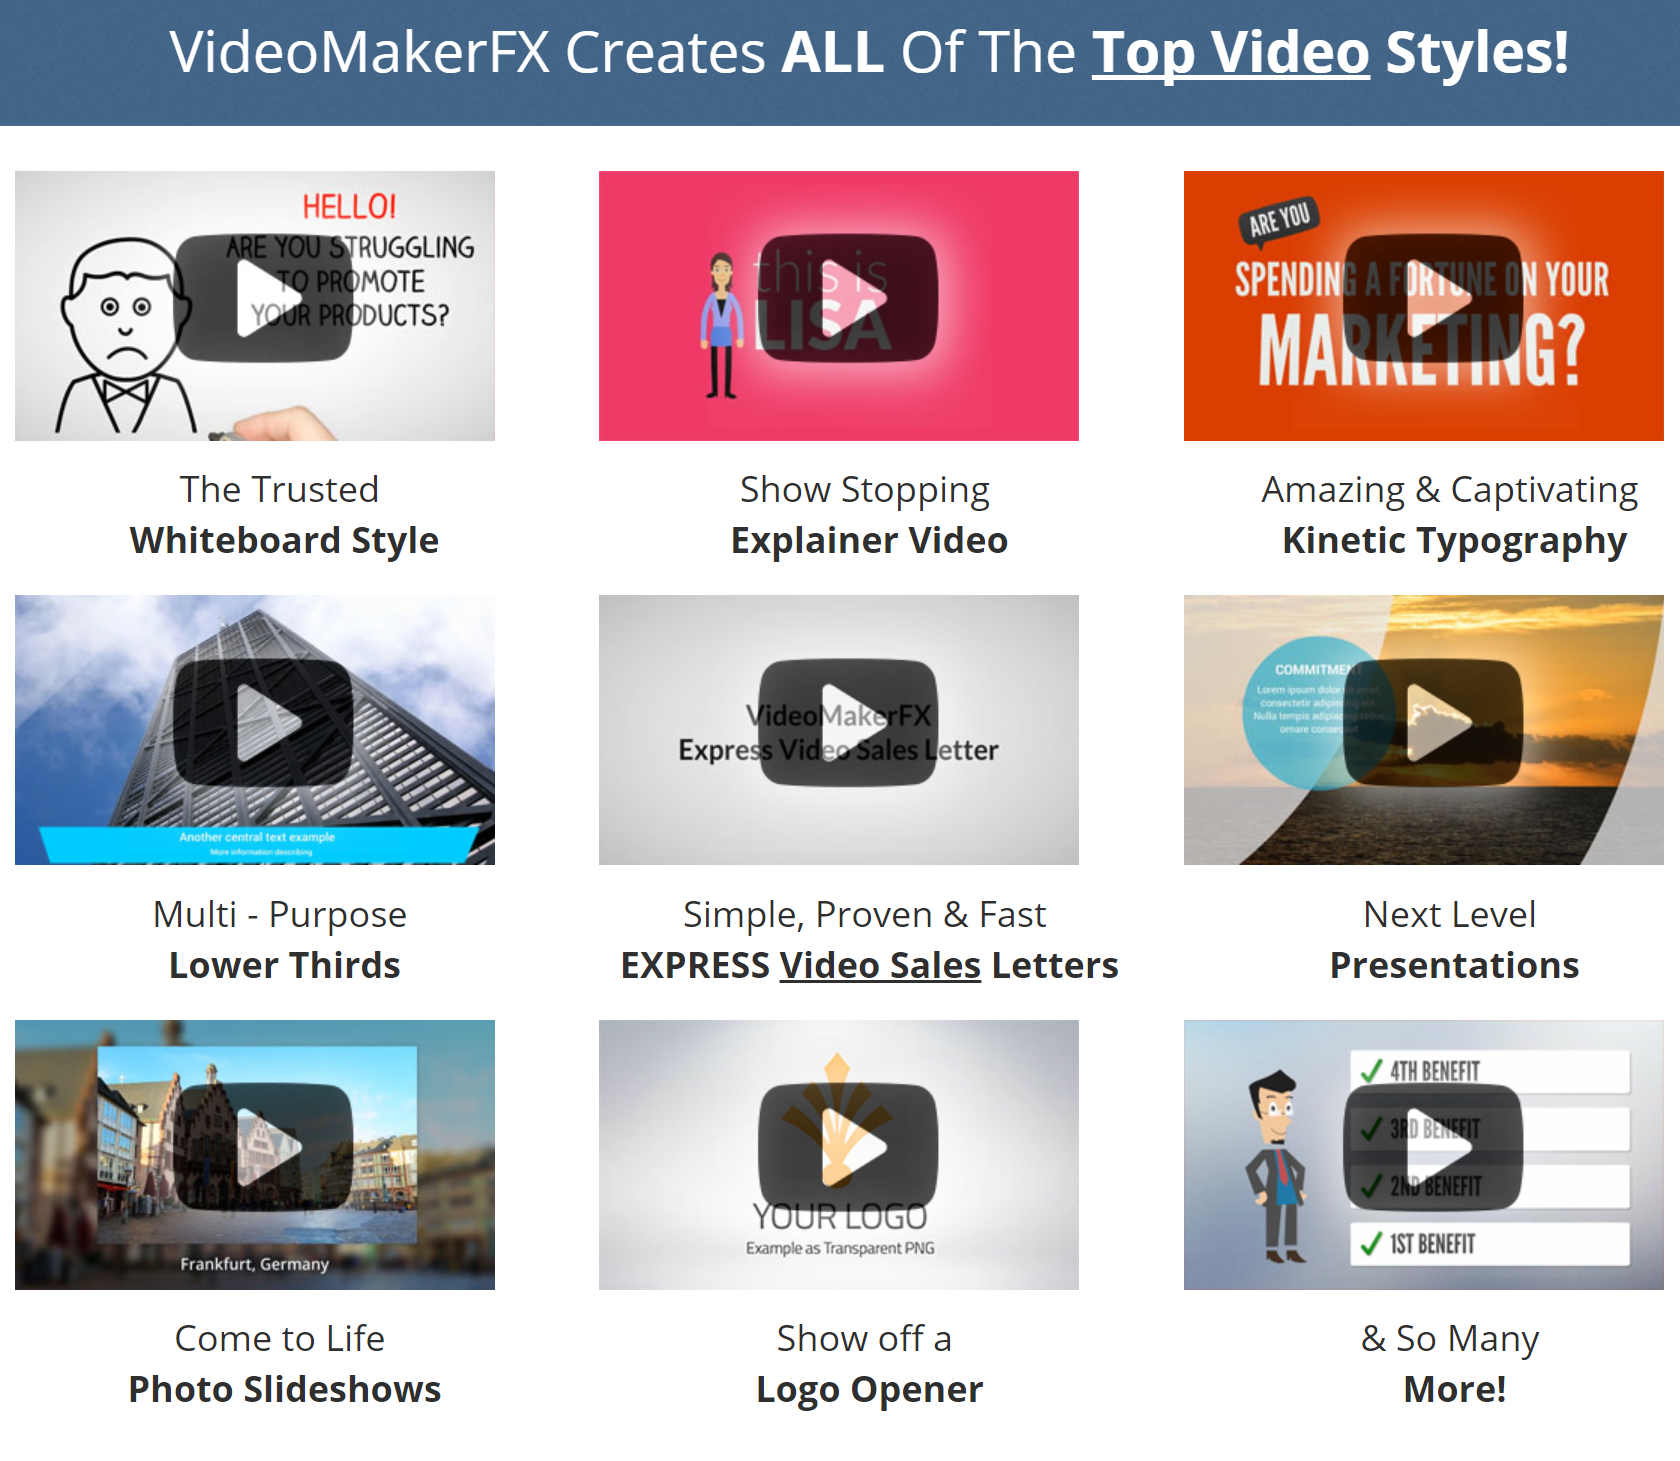 VideoMakerFX-review-bonuses-conyeco.com-LanzaPodcast-8